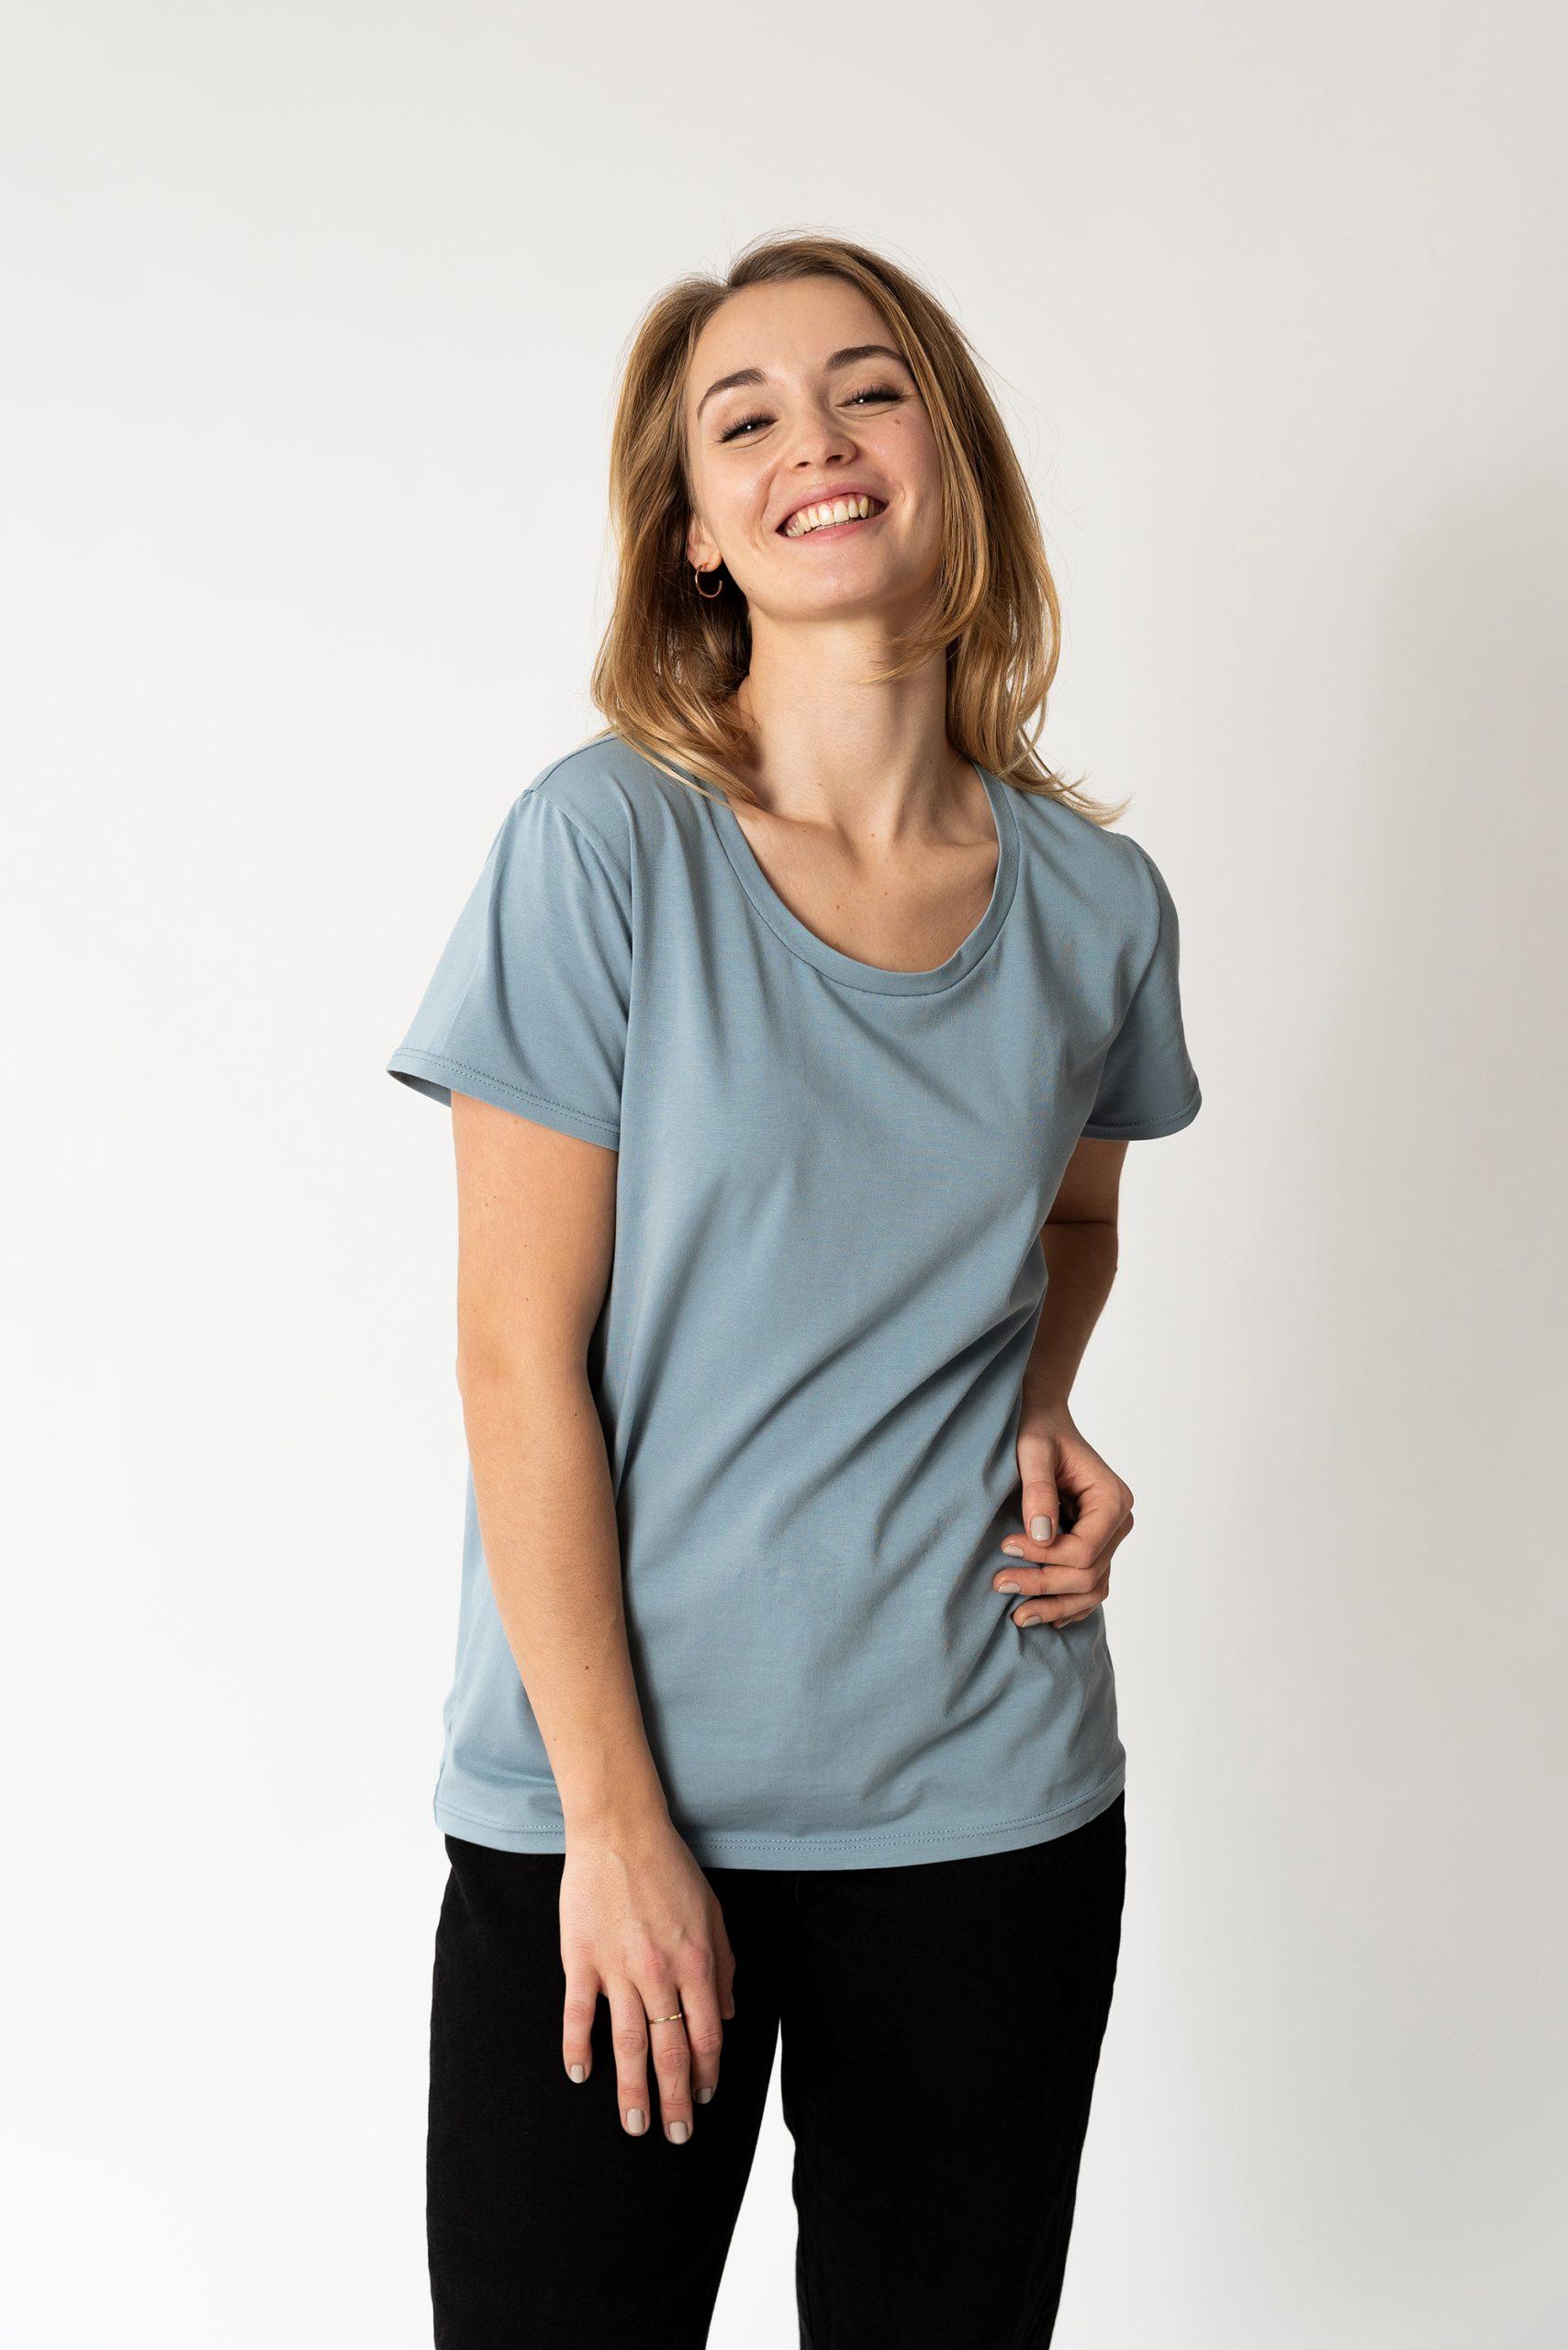 Schnittmuster T-Shirt #swag Tragefoto Model